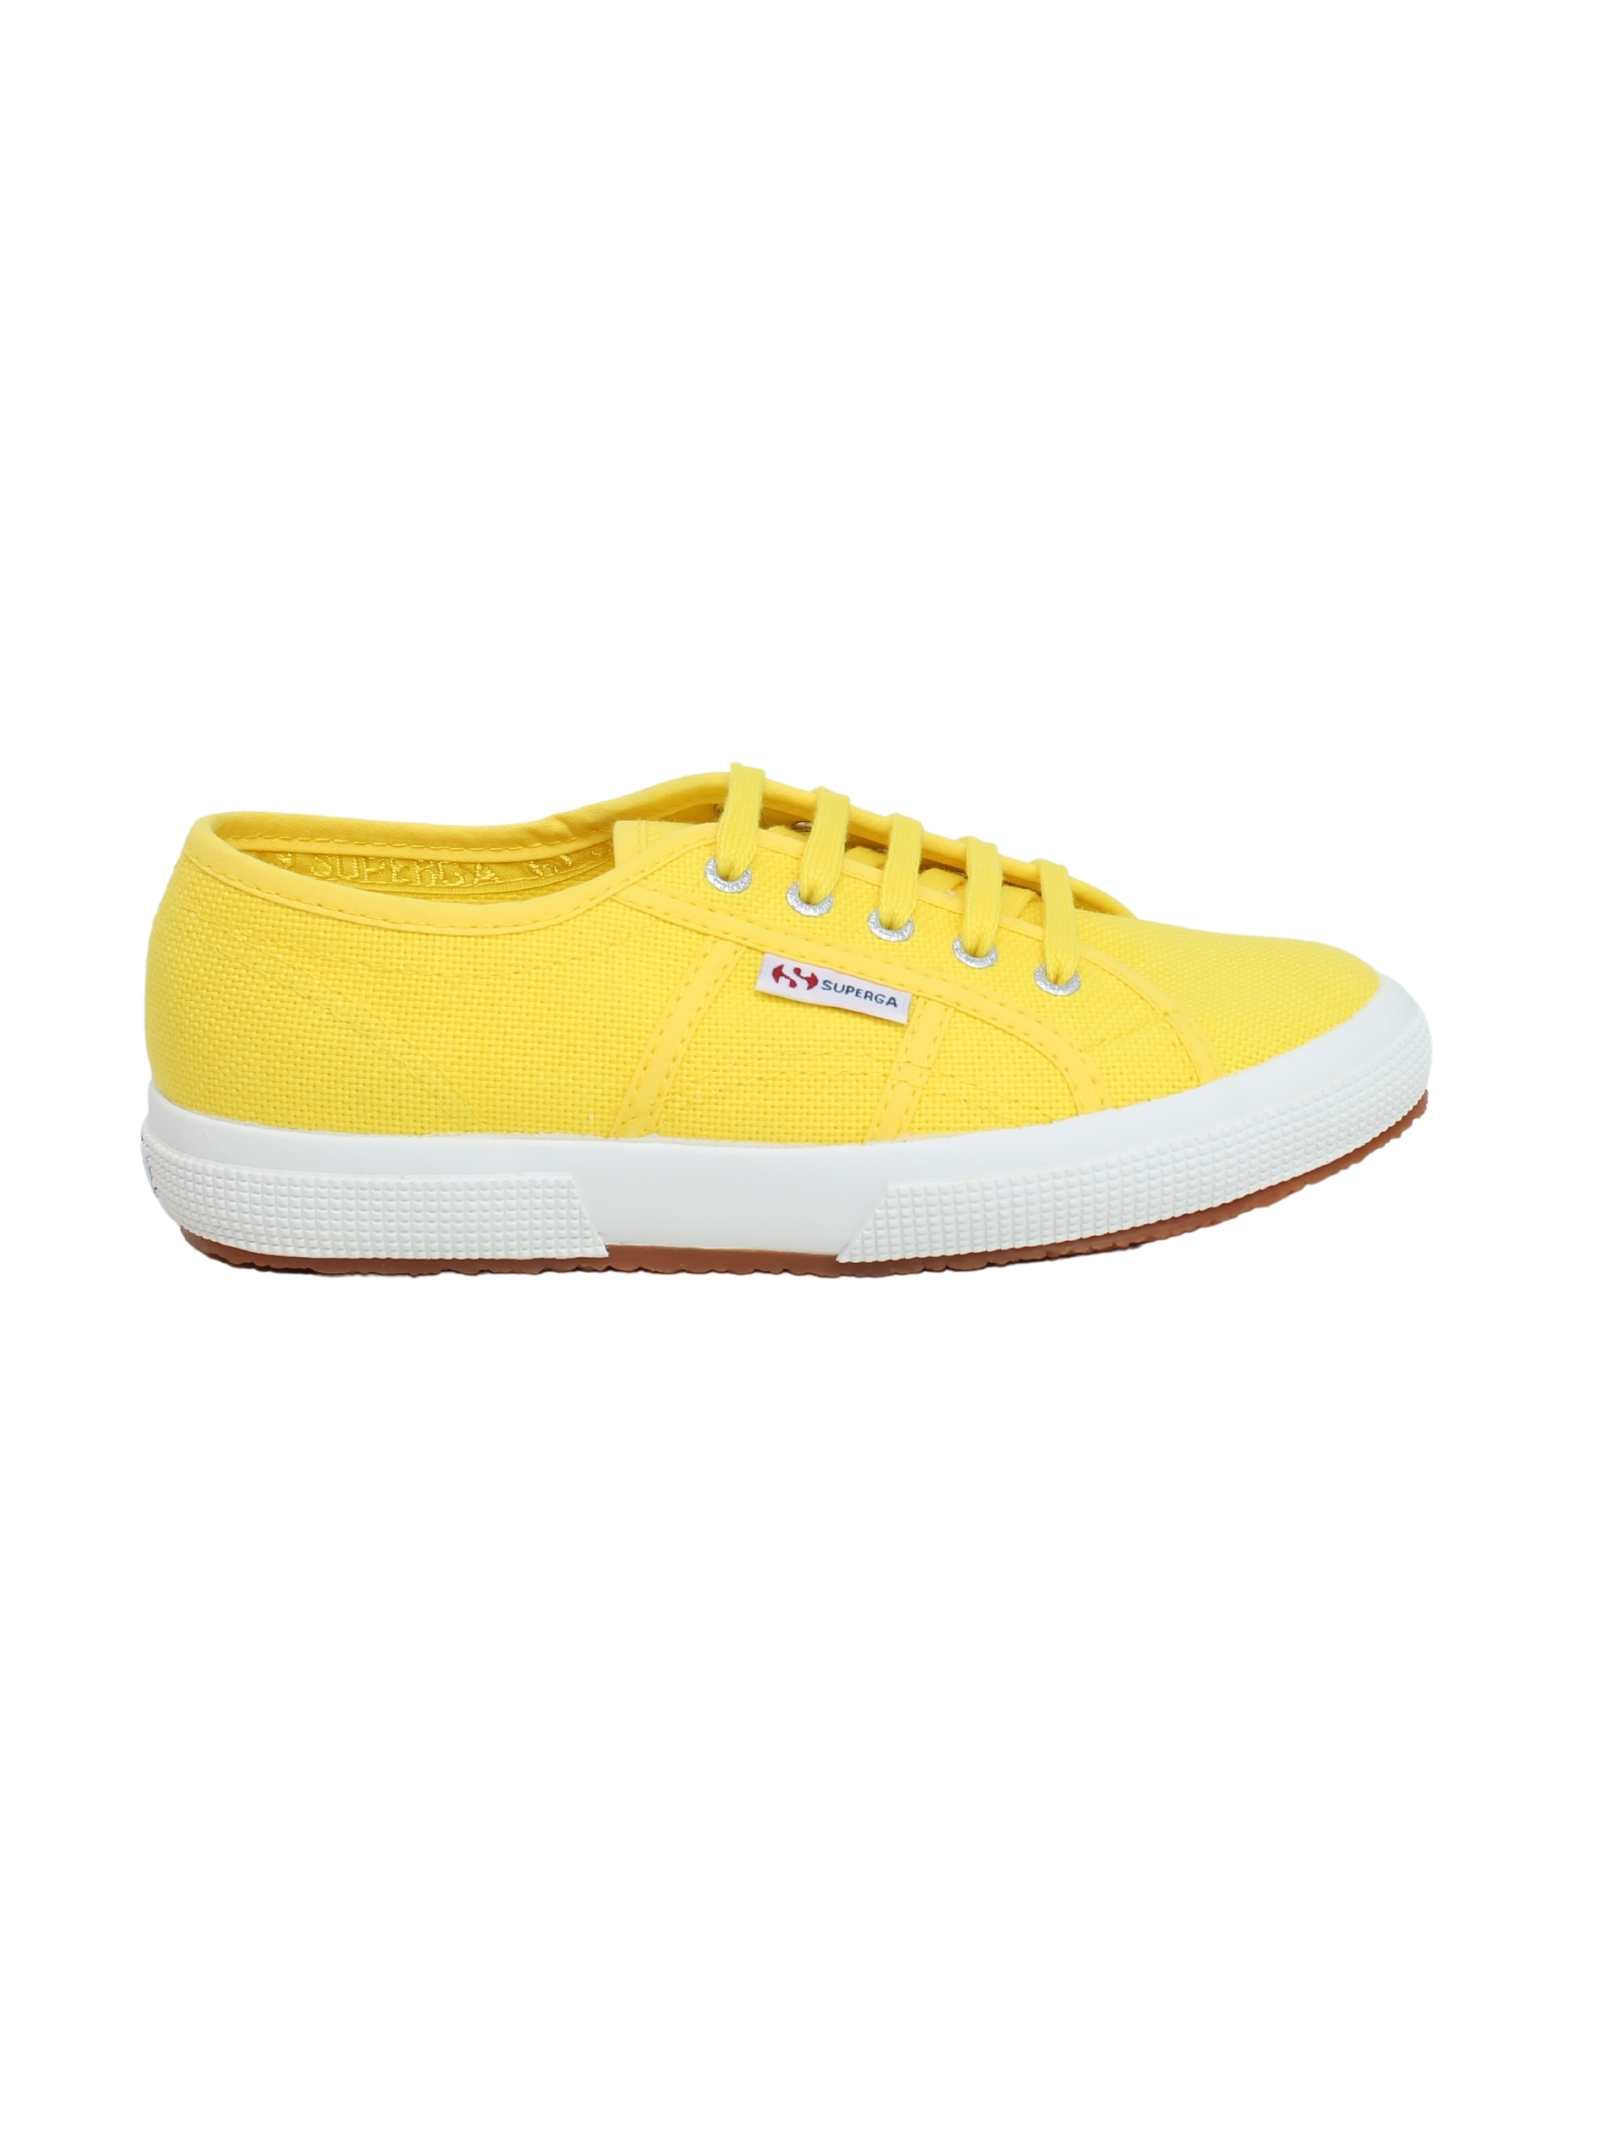 SUPERGA KIDS | Sneakers | 2750YELLOW